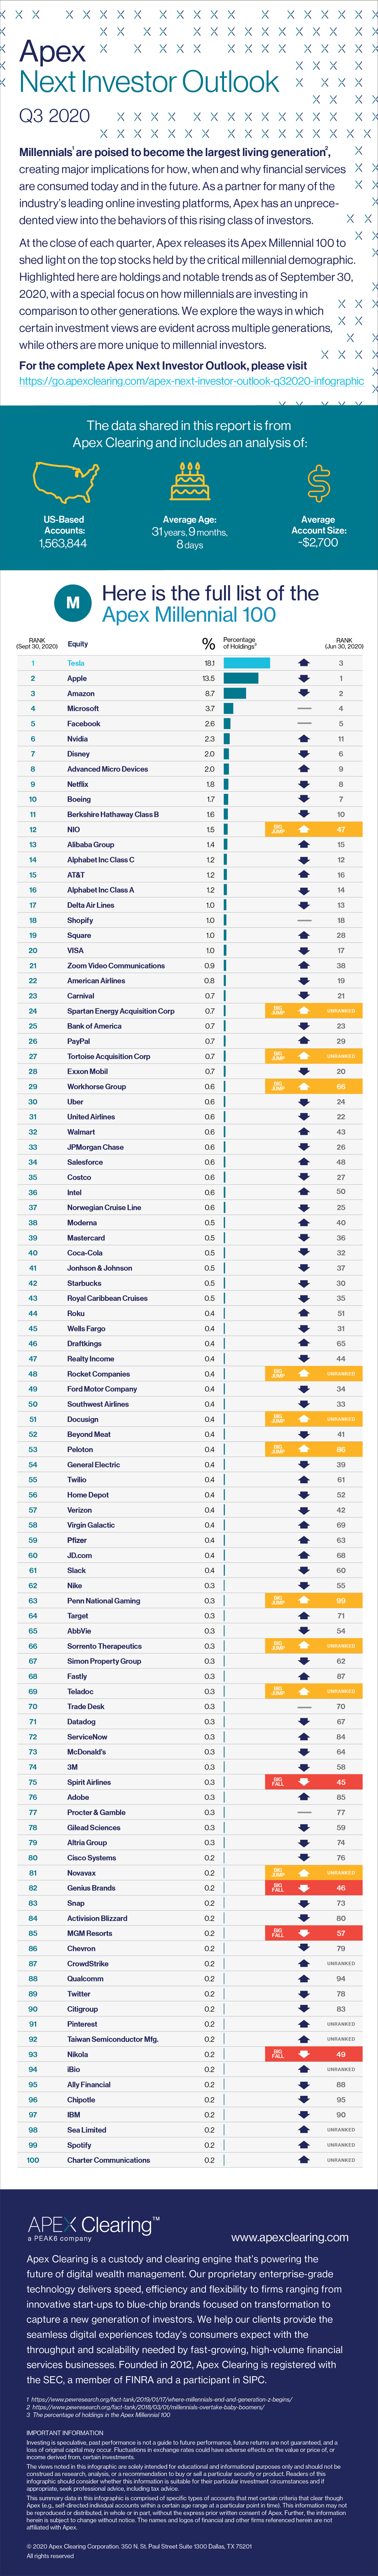 Q3 2020 Apex Next Investor Outlook Top 100